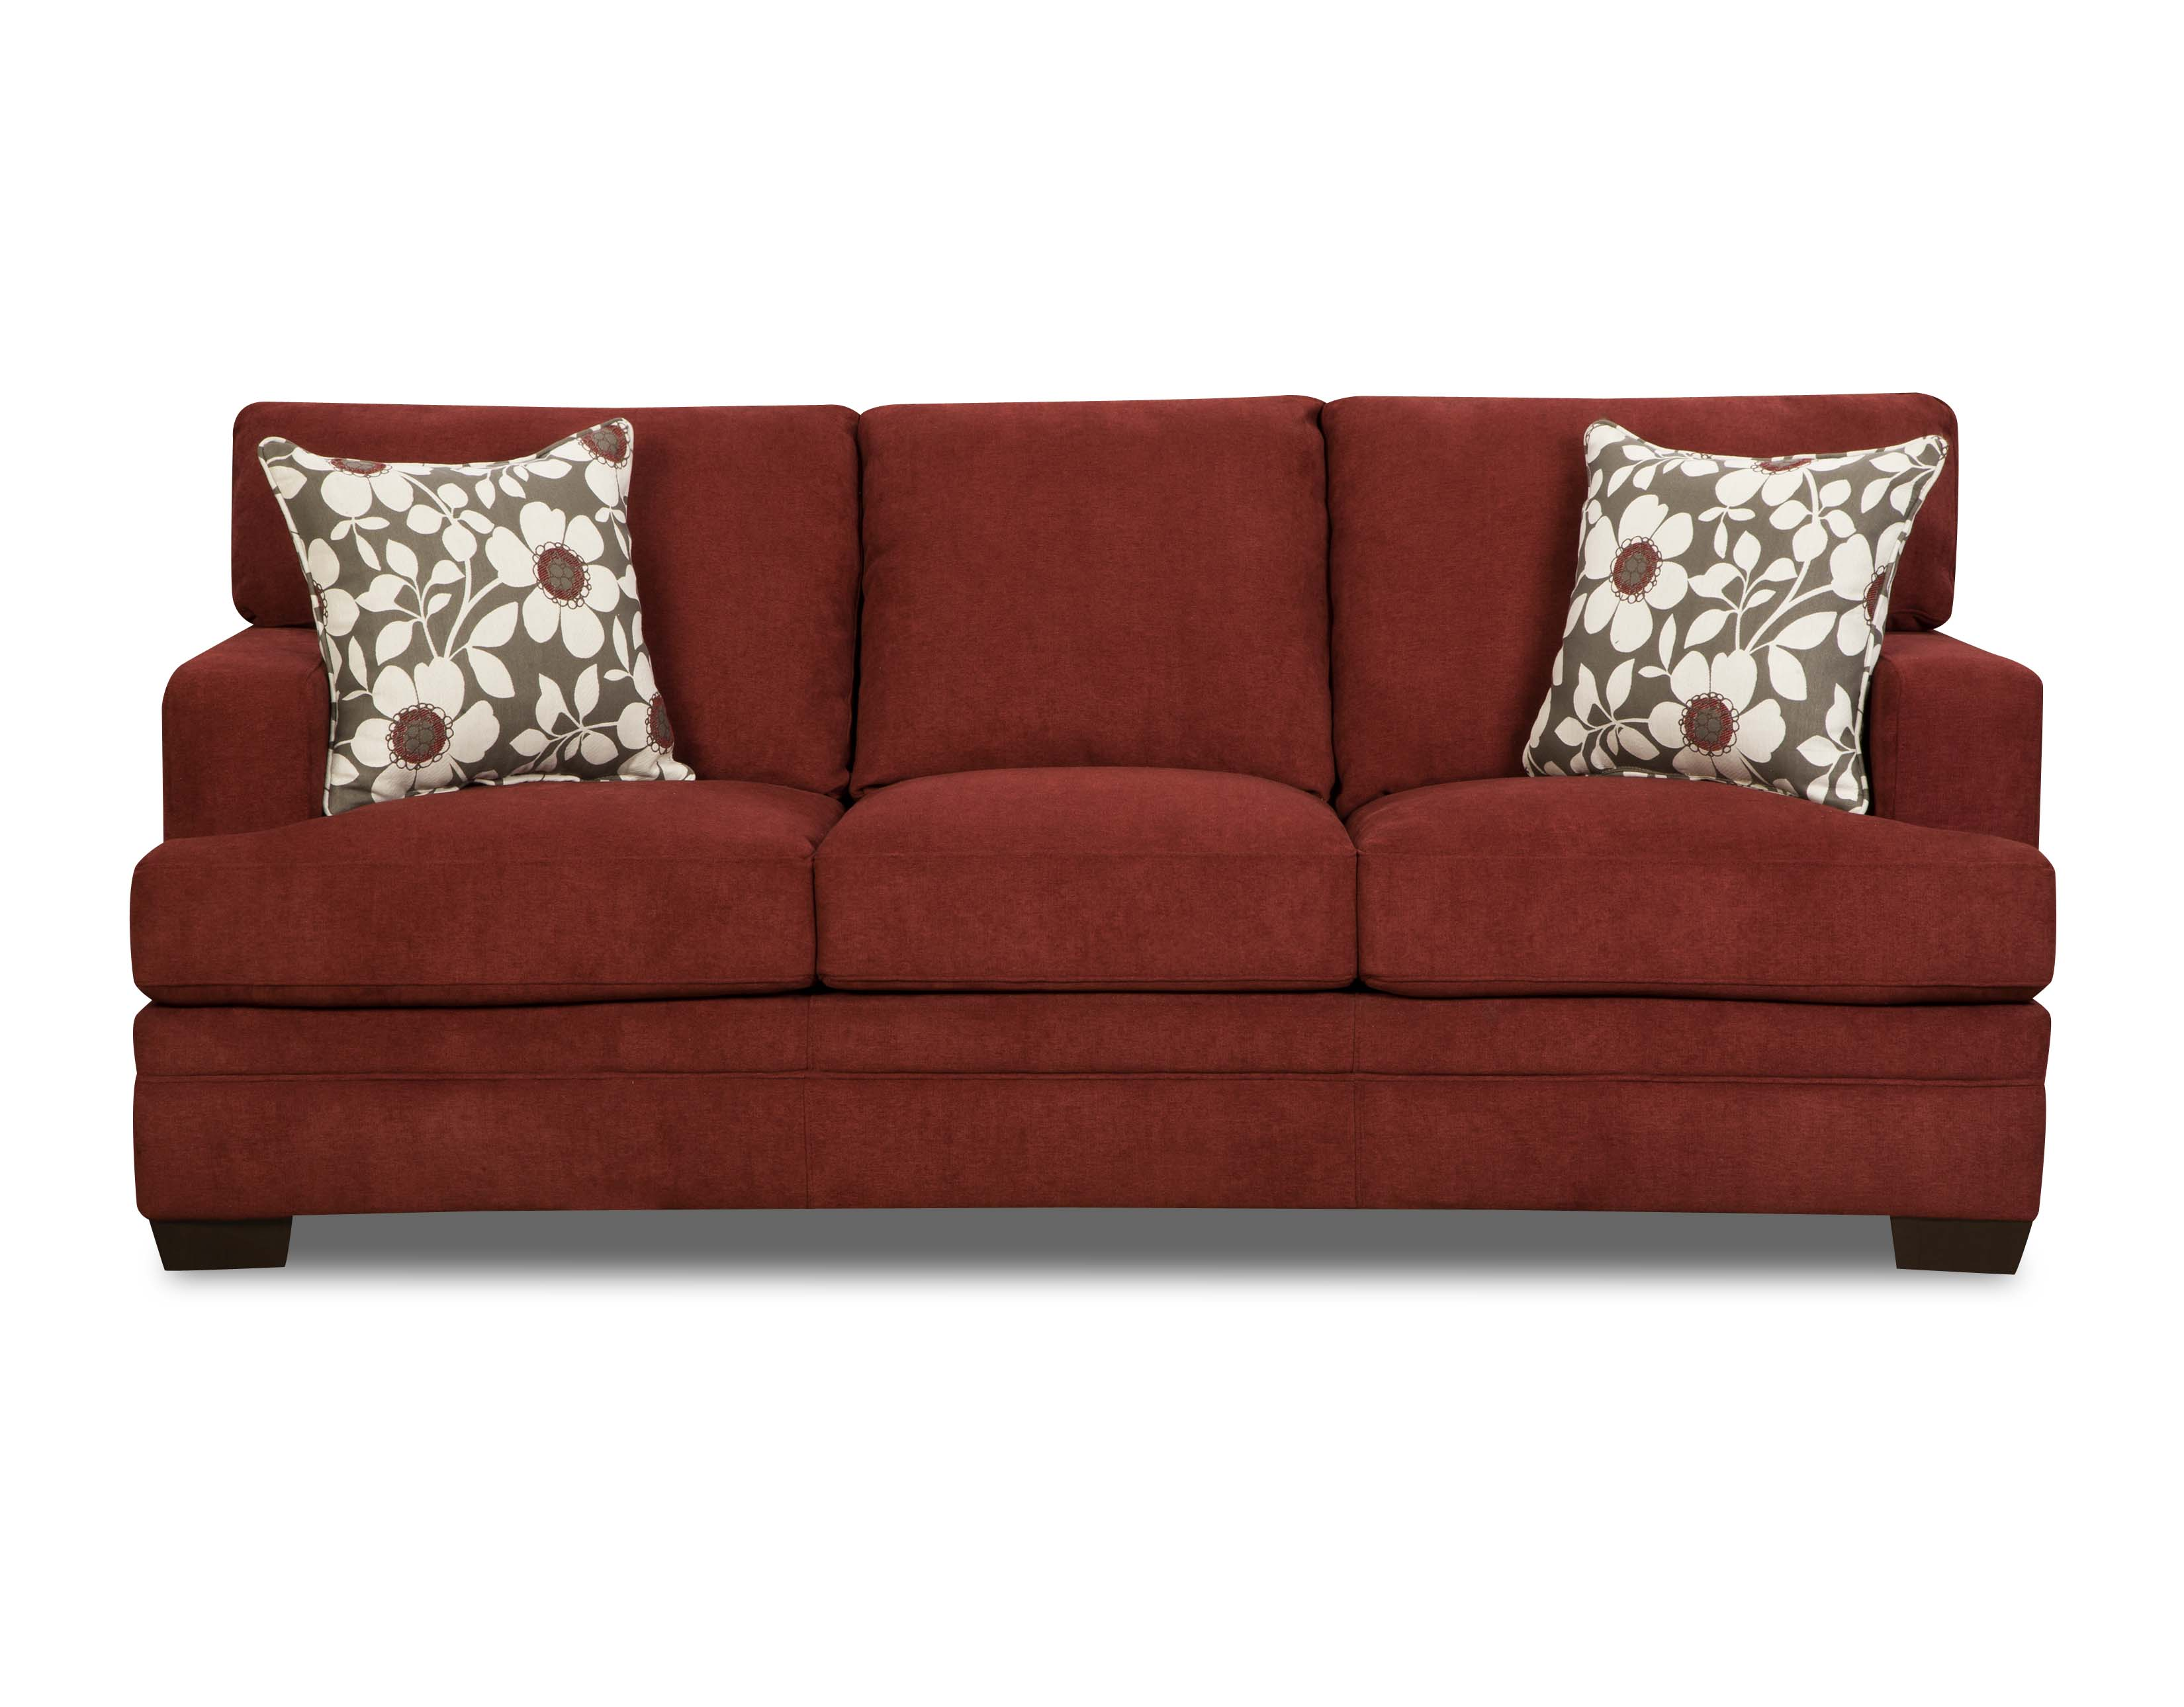 Pellis 3 Piece Living Room Set- Mulberry